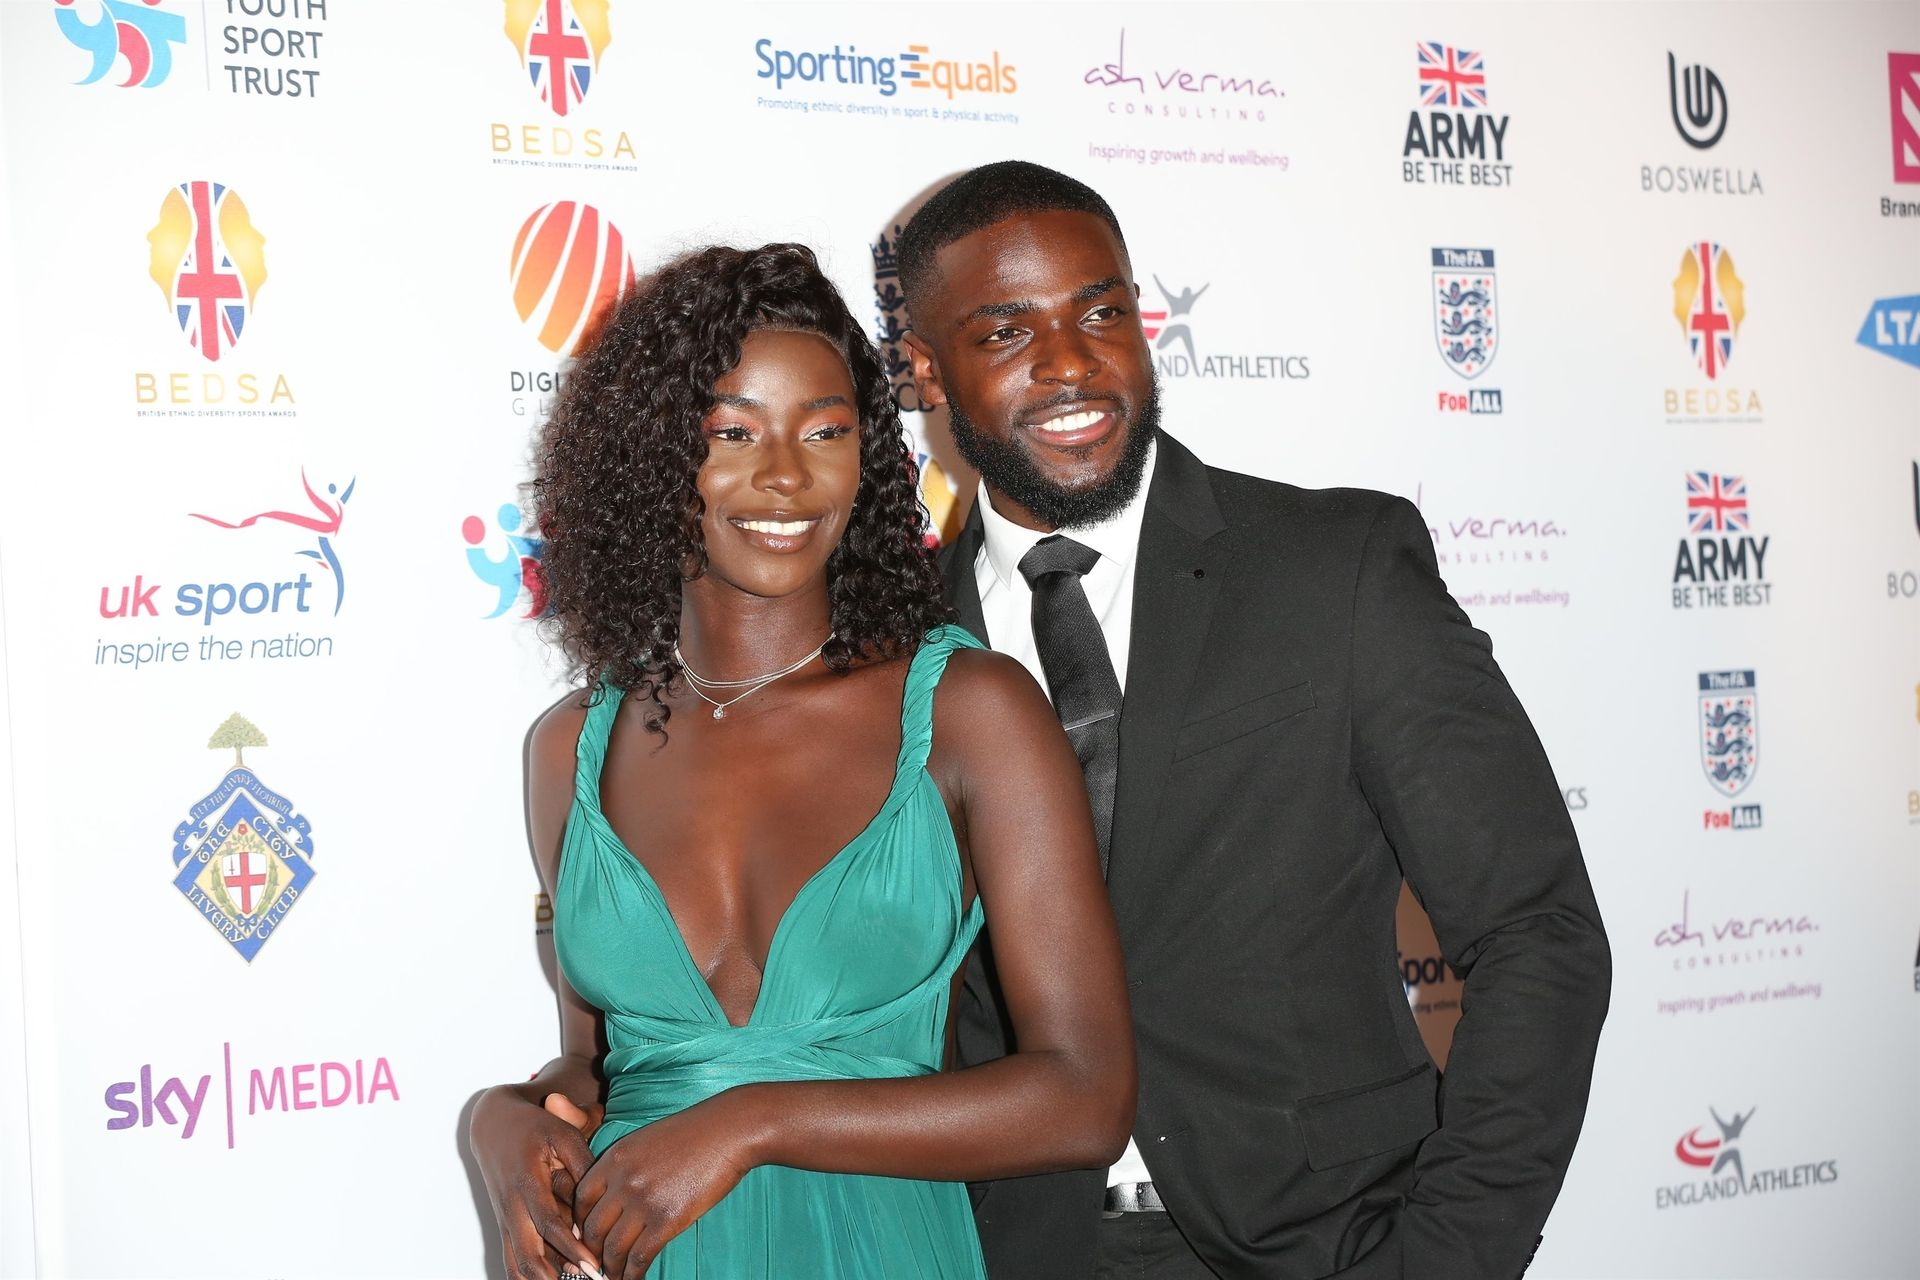 Mike Boateng & Priscilla Anyabu Are Seen At British Ethnic Diversity Sports Awards 0056